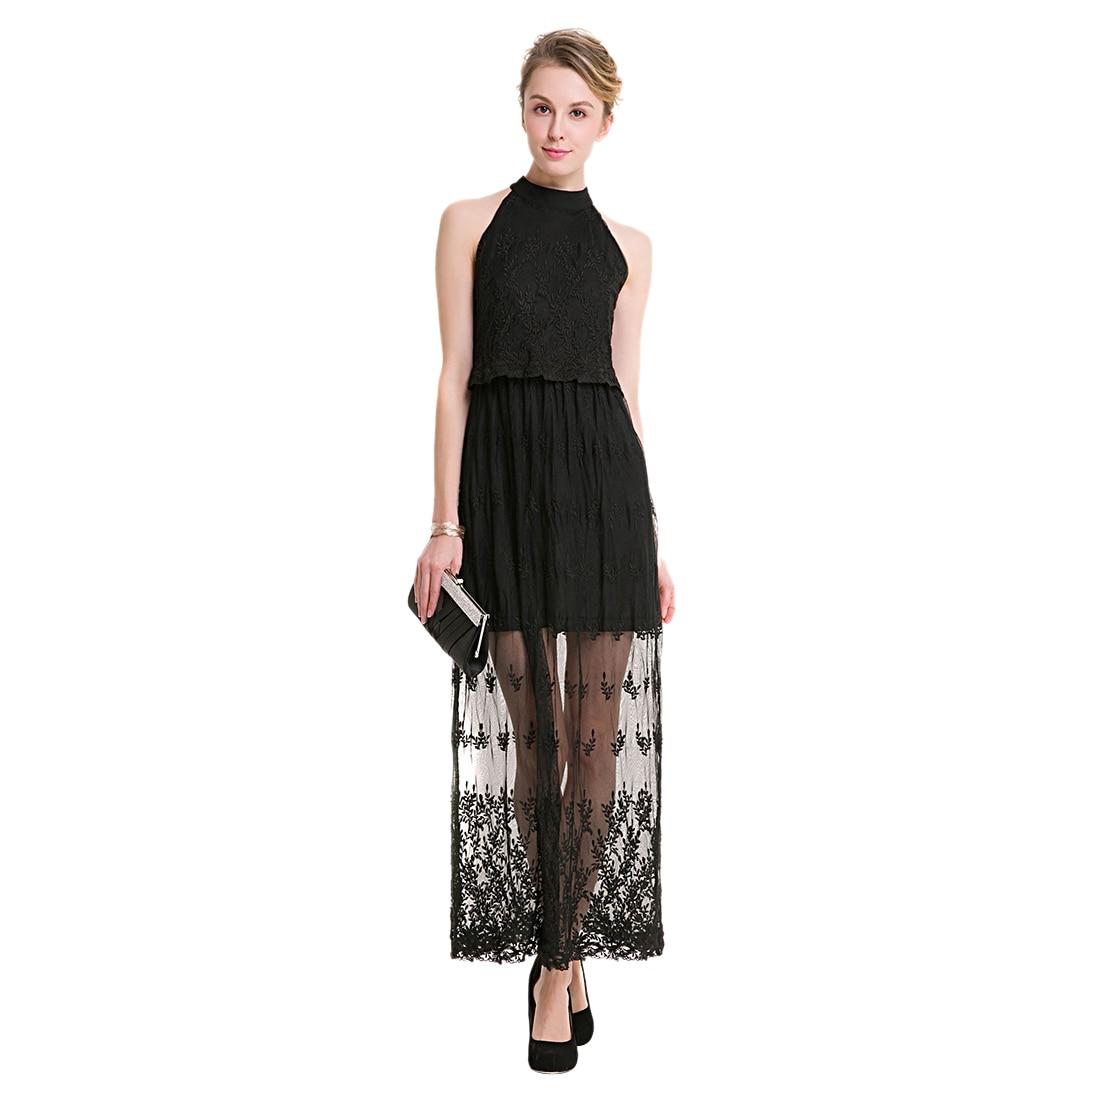 TFGS Original Design Women Fashion Elegant Lace Office Lady Dress Summer Sleeveless Halter Neck Vintage Long